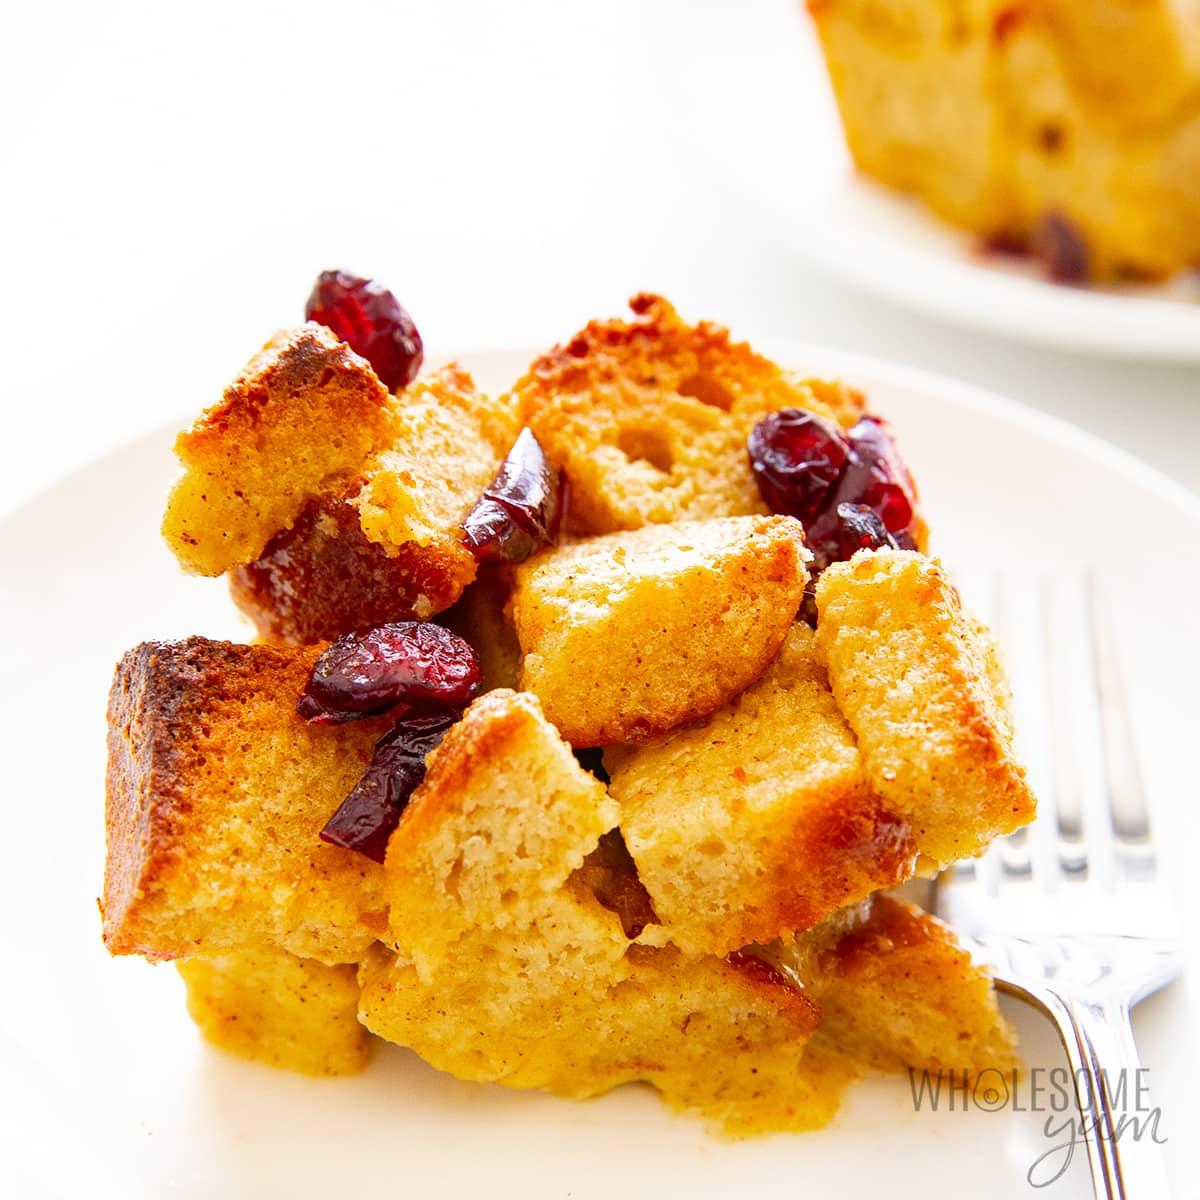 Keto bread pudding recipe close up on a plate